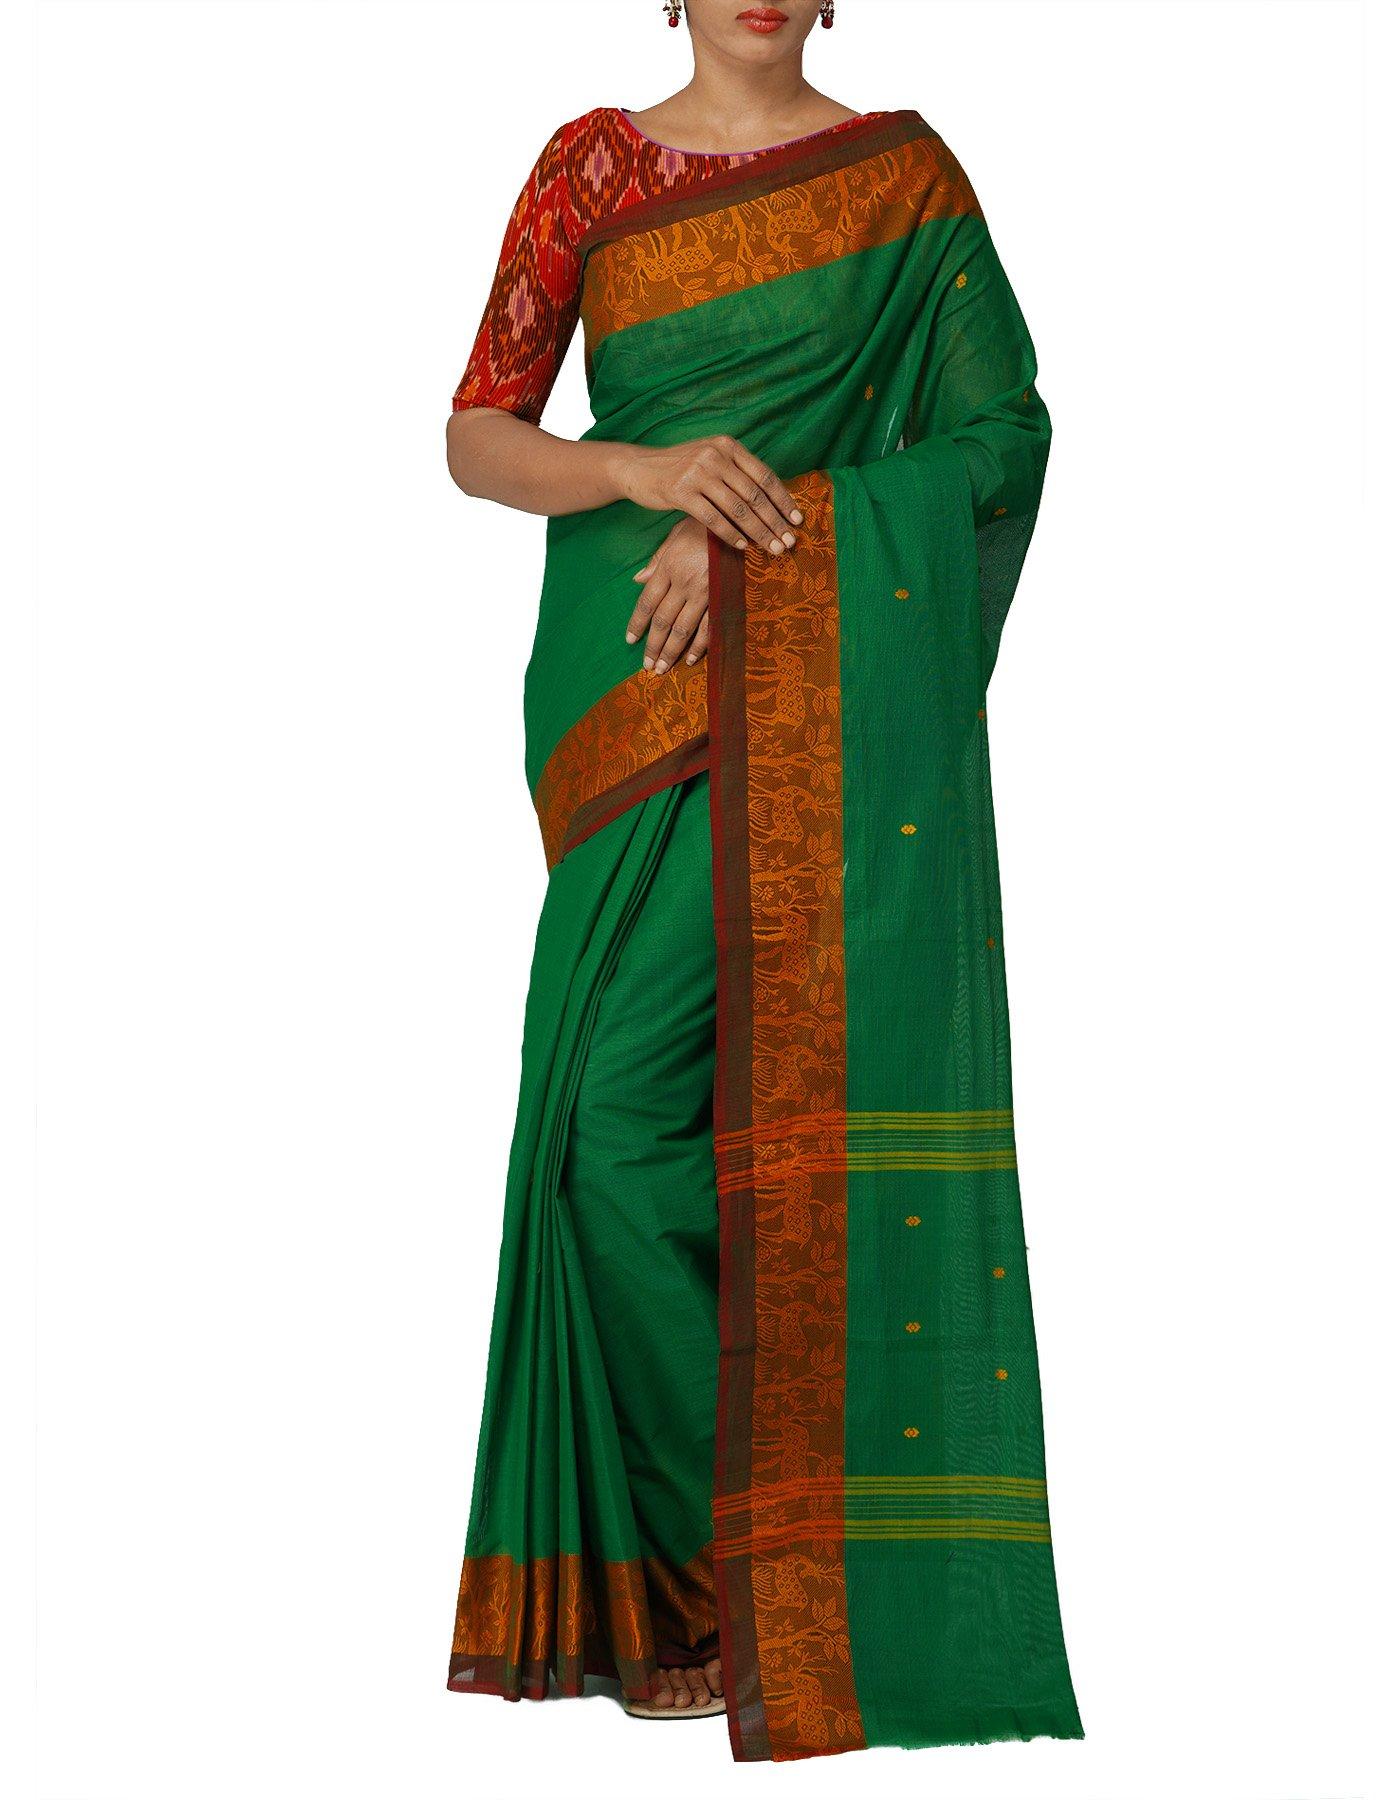 e60669a7d5 Unnati Silks Women Green Pure Handloom Kanchi Cotton Saree with ...